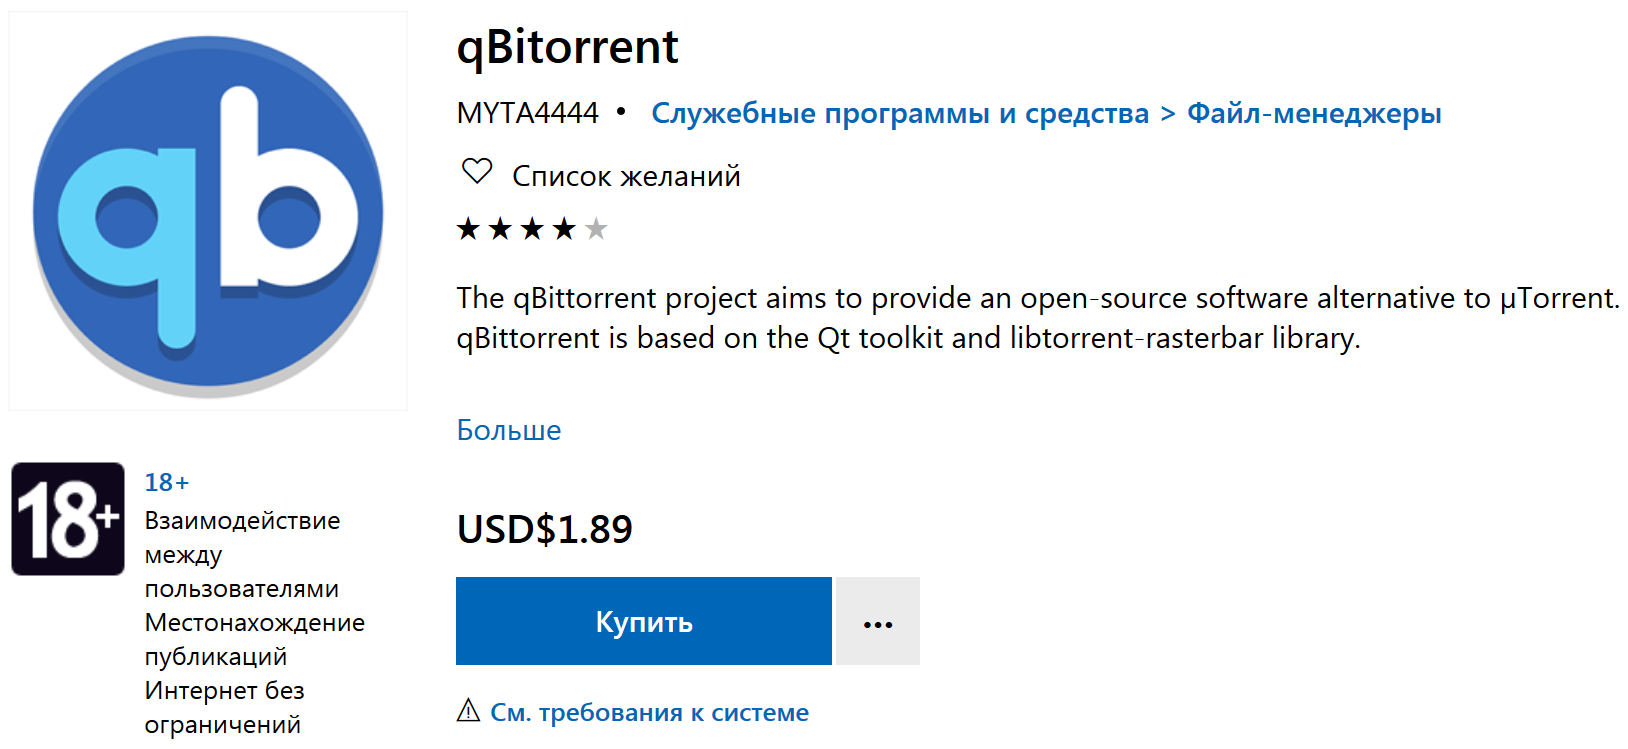 qBittorrent в Windows Store - подделка